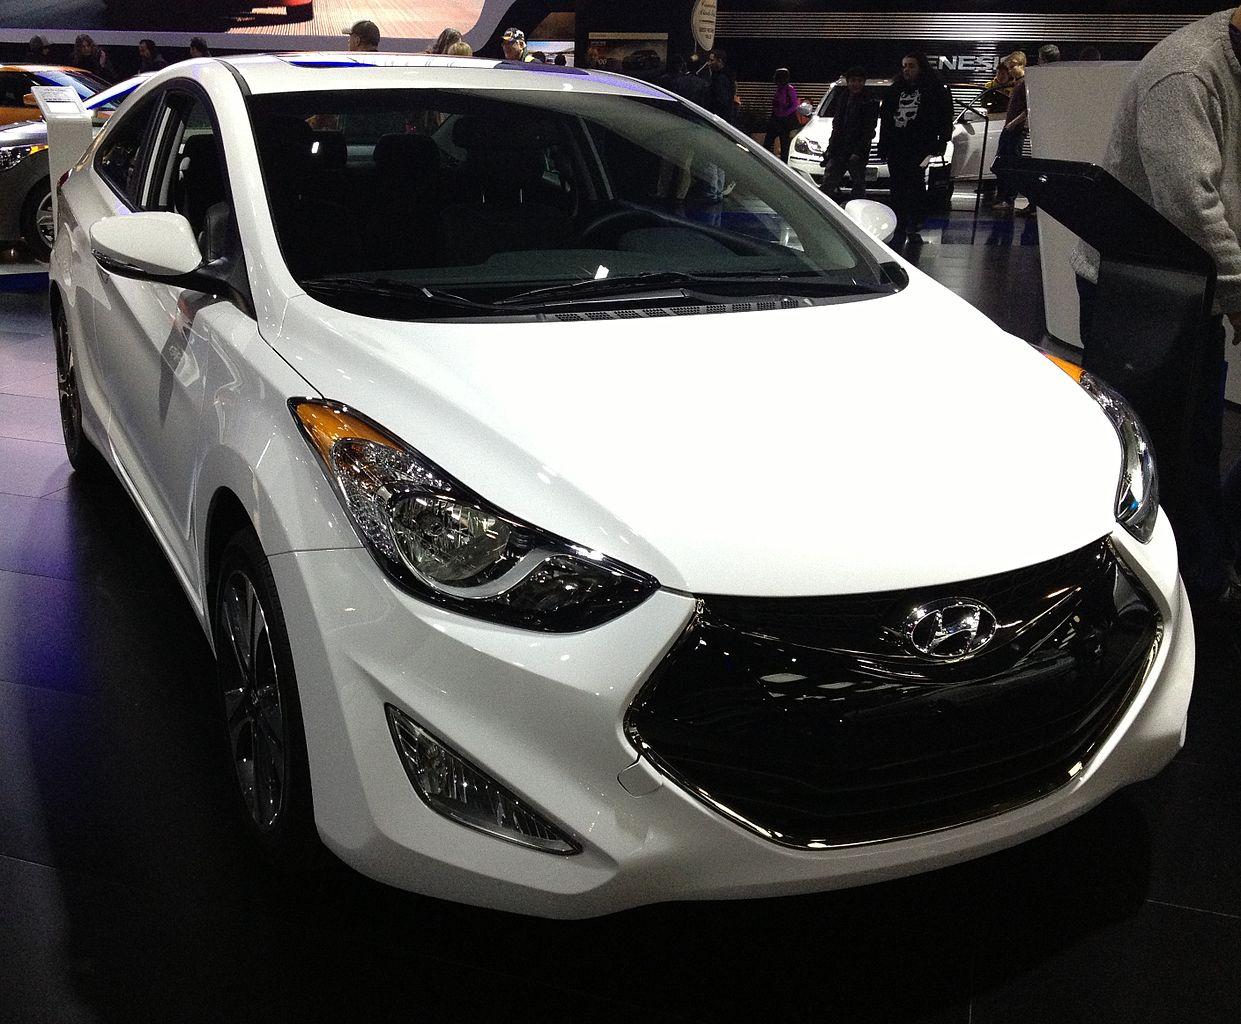 2013 Hyundai Elantra Fuel Tank